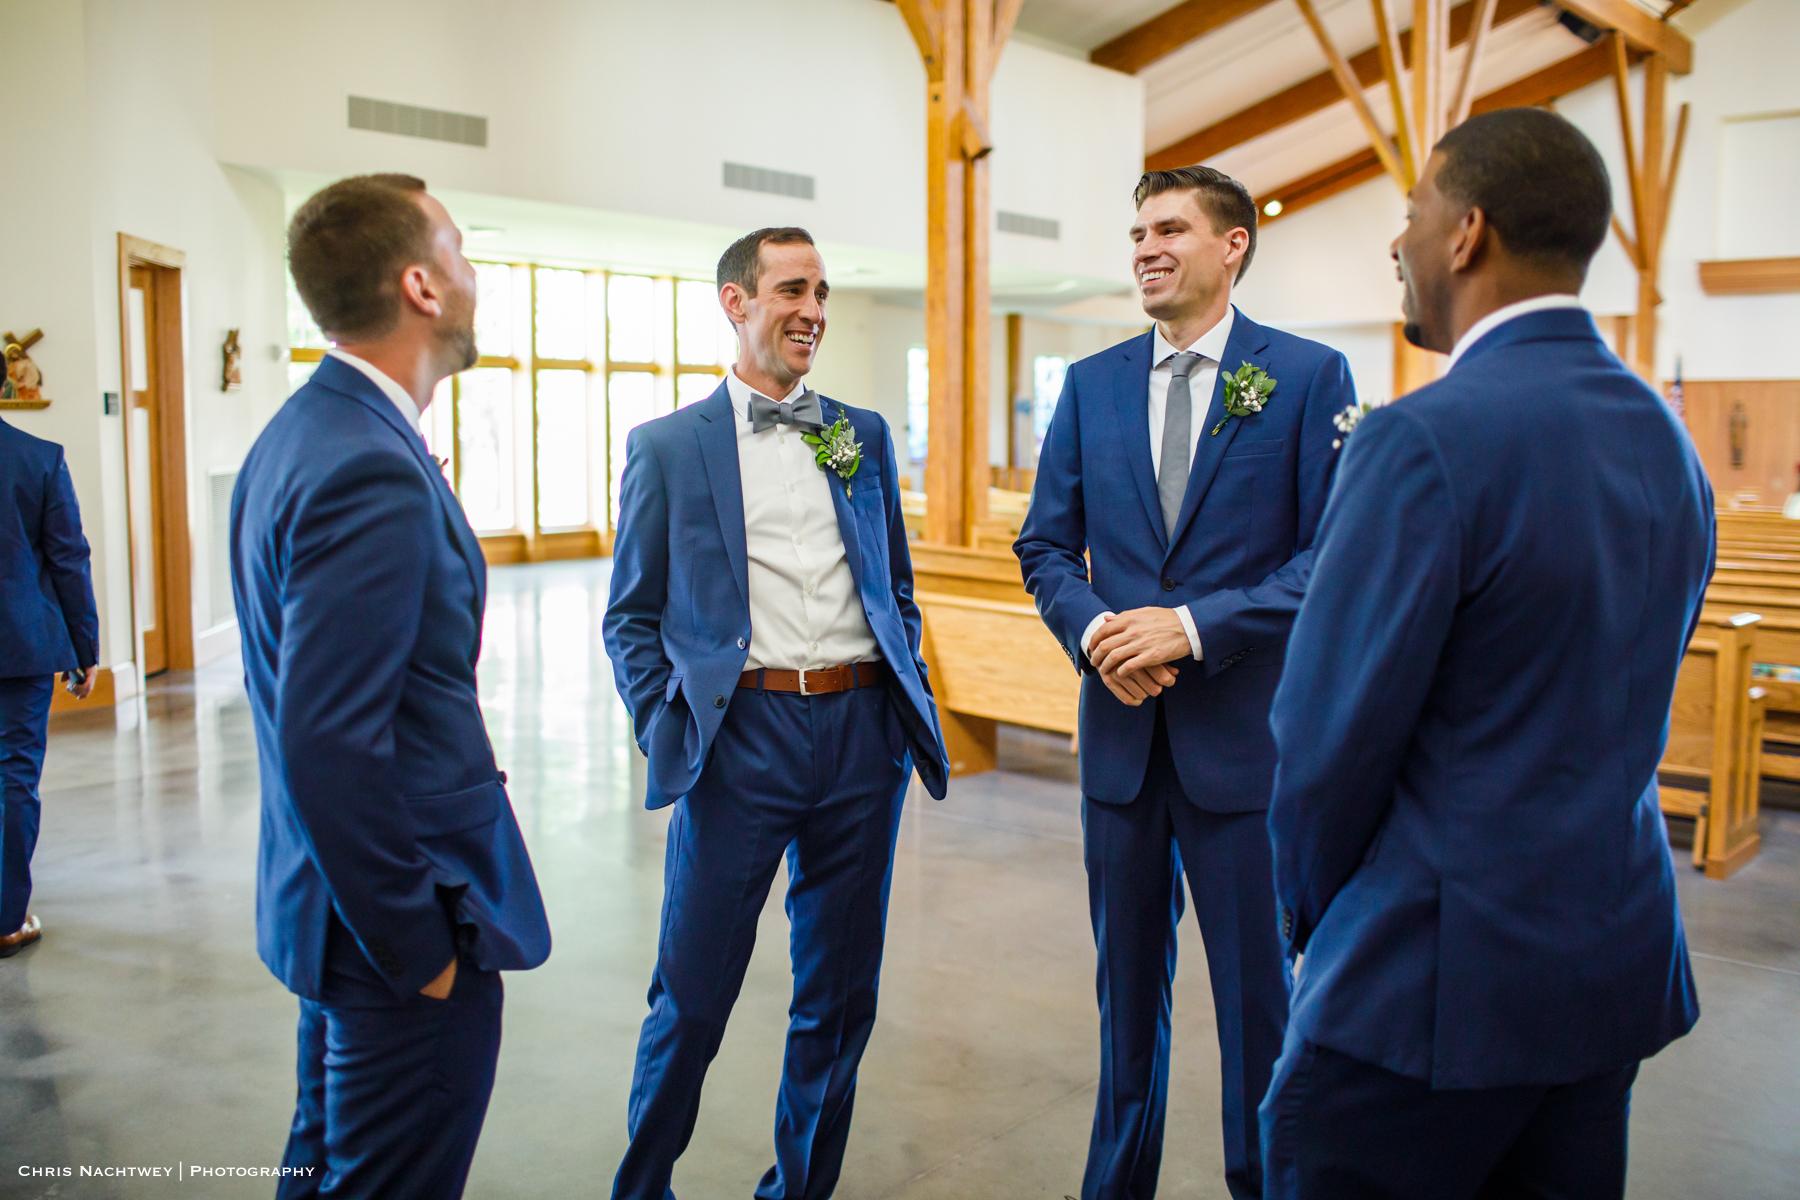 photos-wedding-quidnessett-country-club-ri-chris-nachtwey-photography-2018-16.jpg